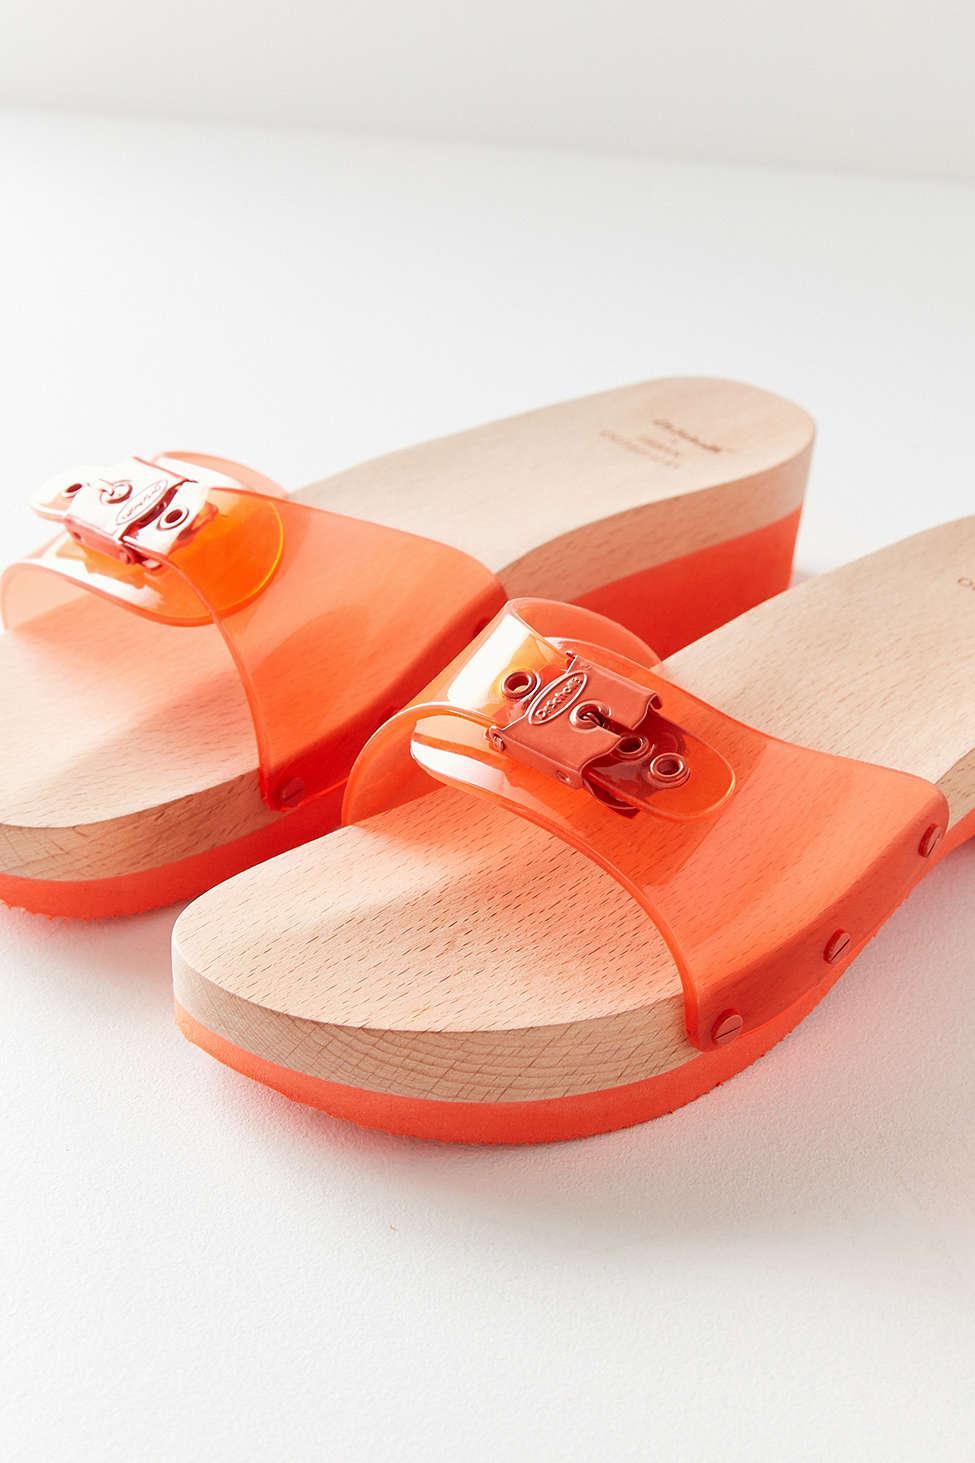 d7048fe53 Dr. Scholls X Uo Original Sandal in Orange - Lyst